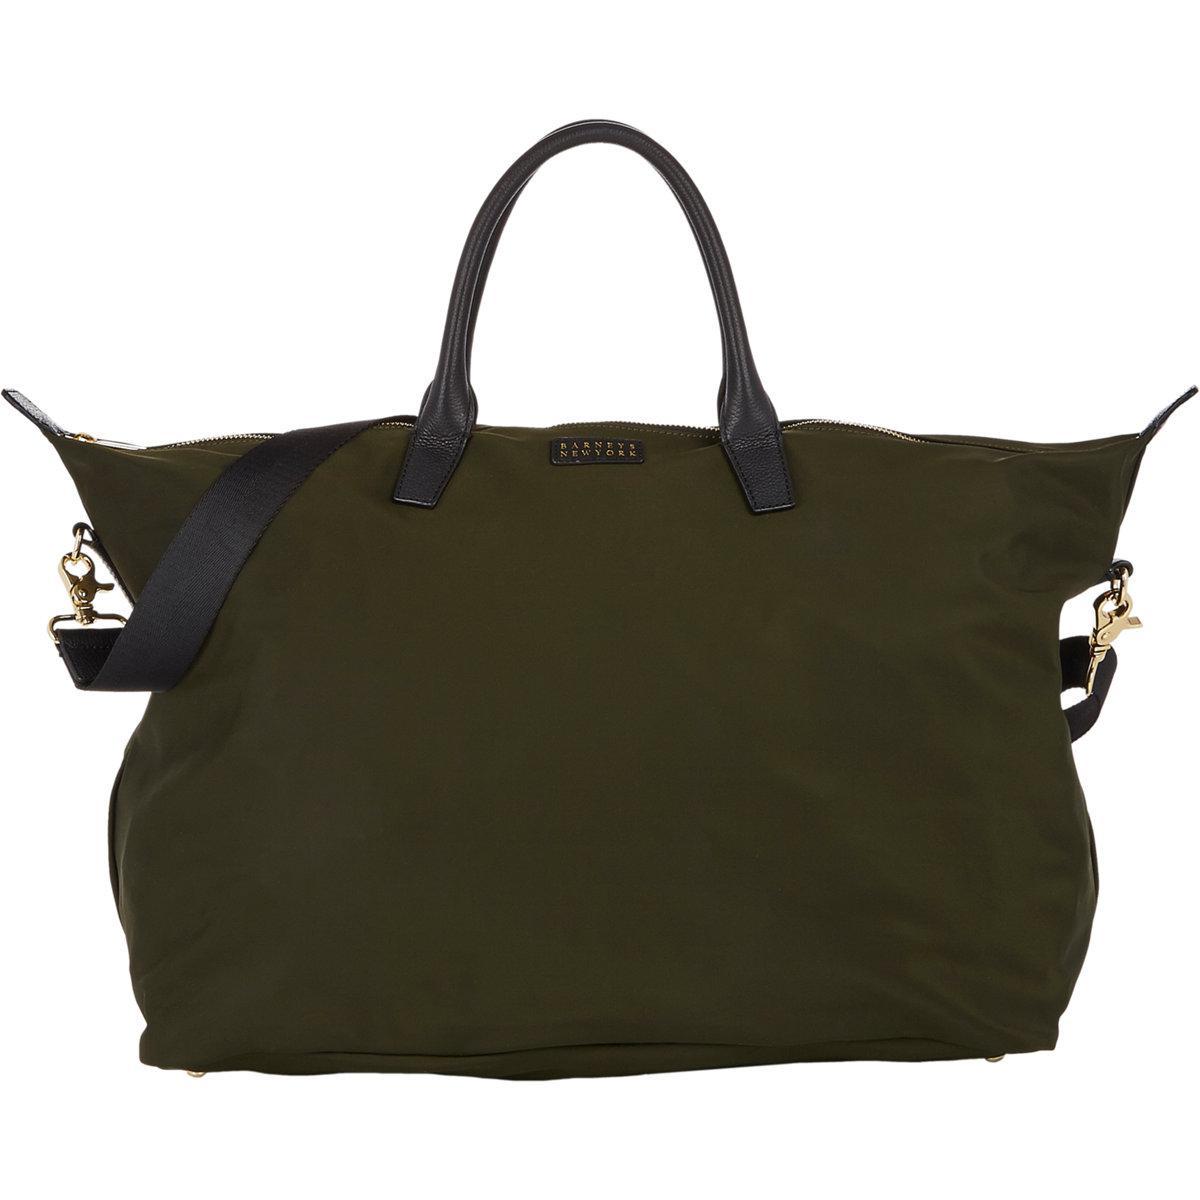 Womens Medium Weekender Bag Barneys New York 0Qnb8